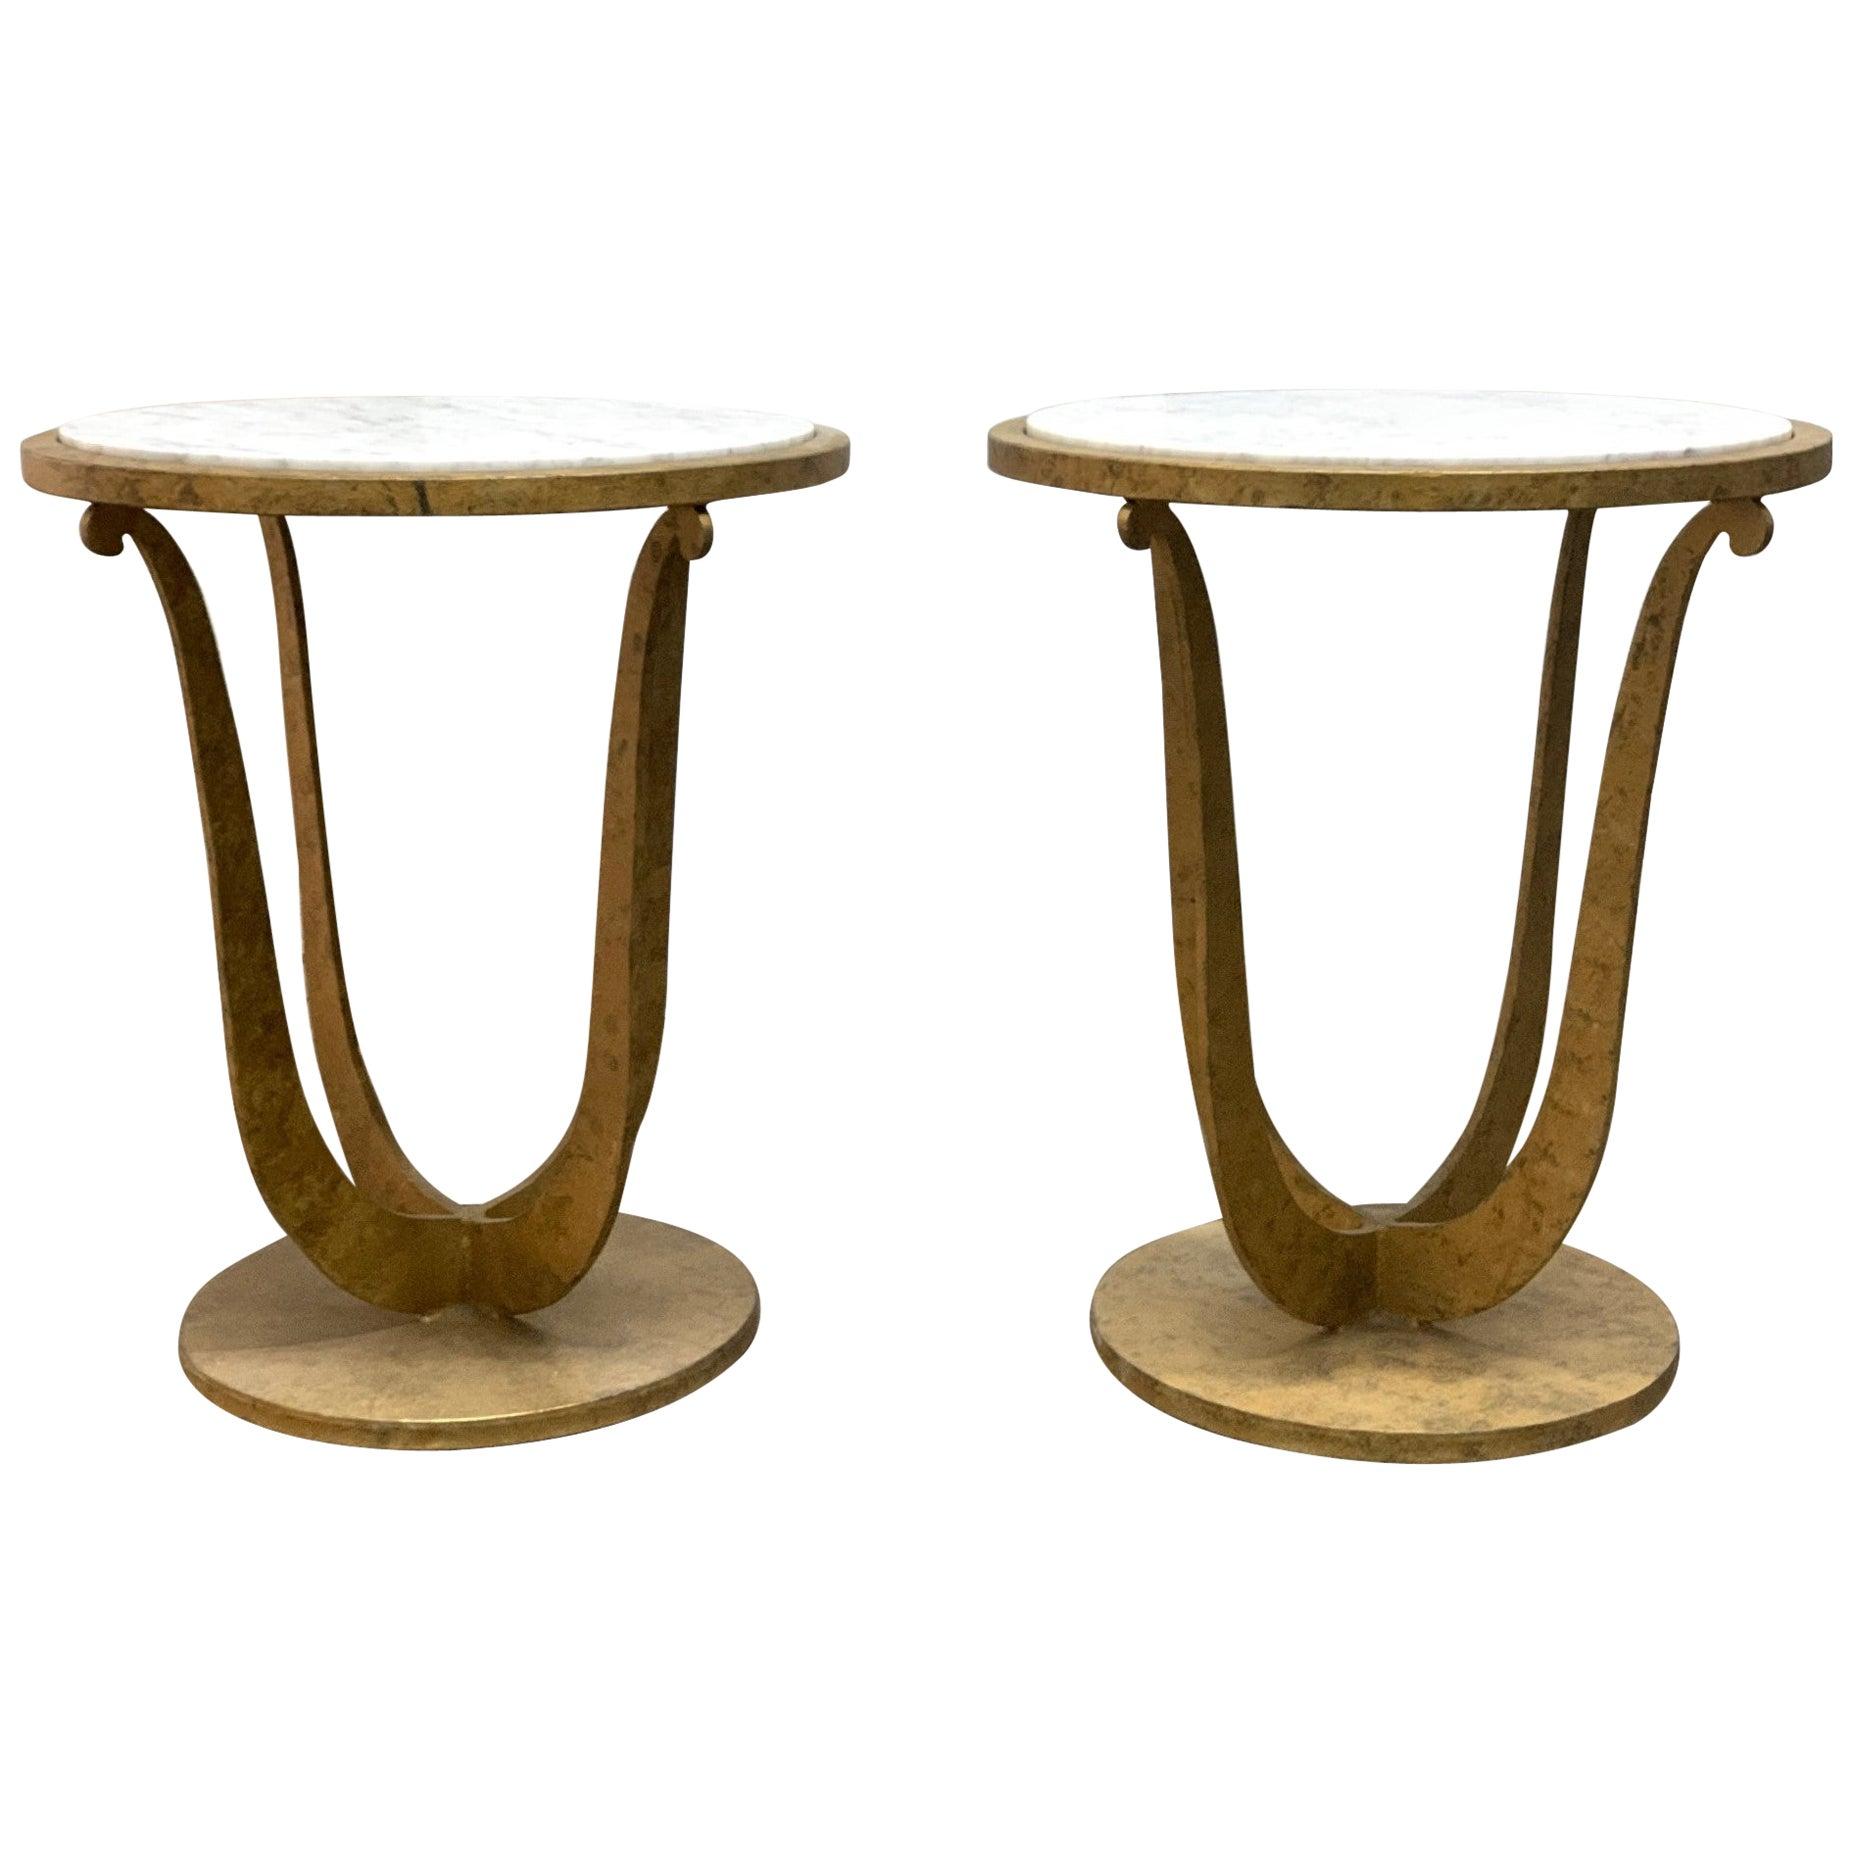 Pair of Gilt Iron and Carrara Marble-Top Gueridon Tables